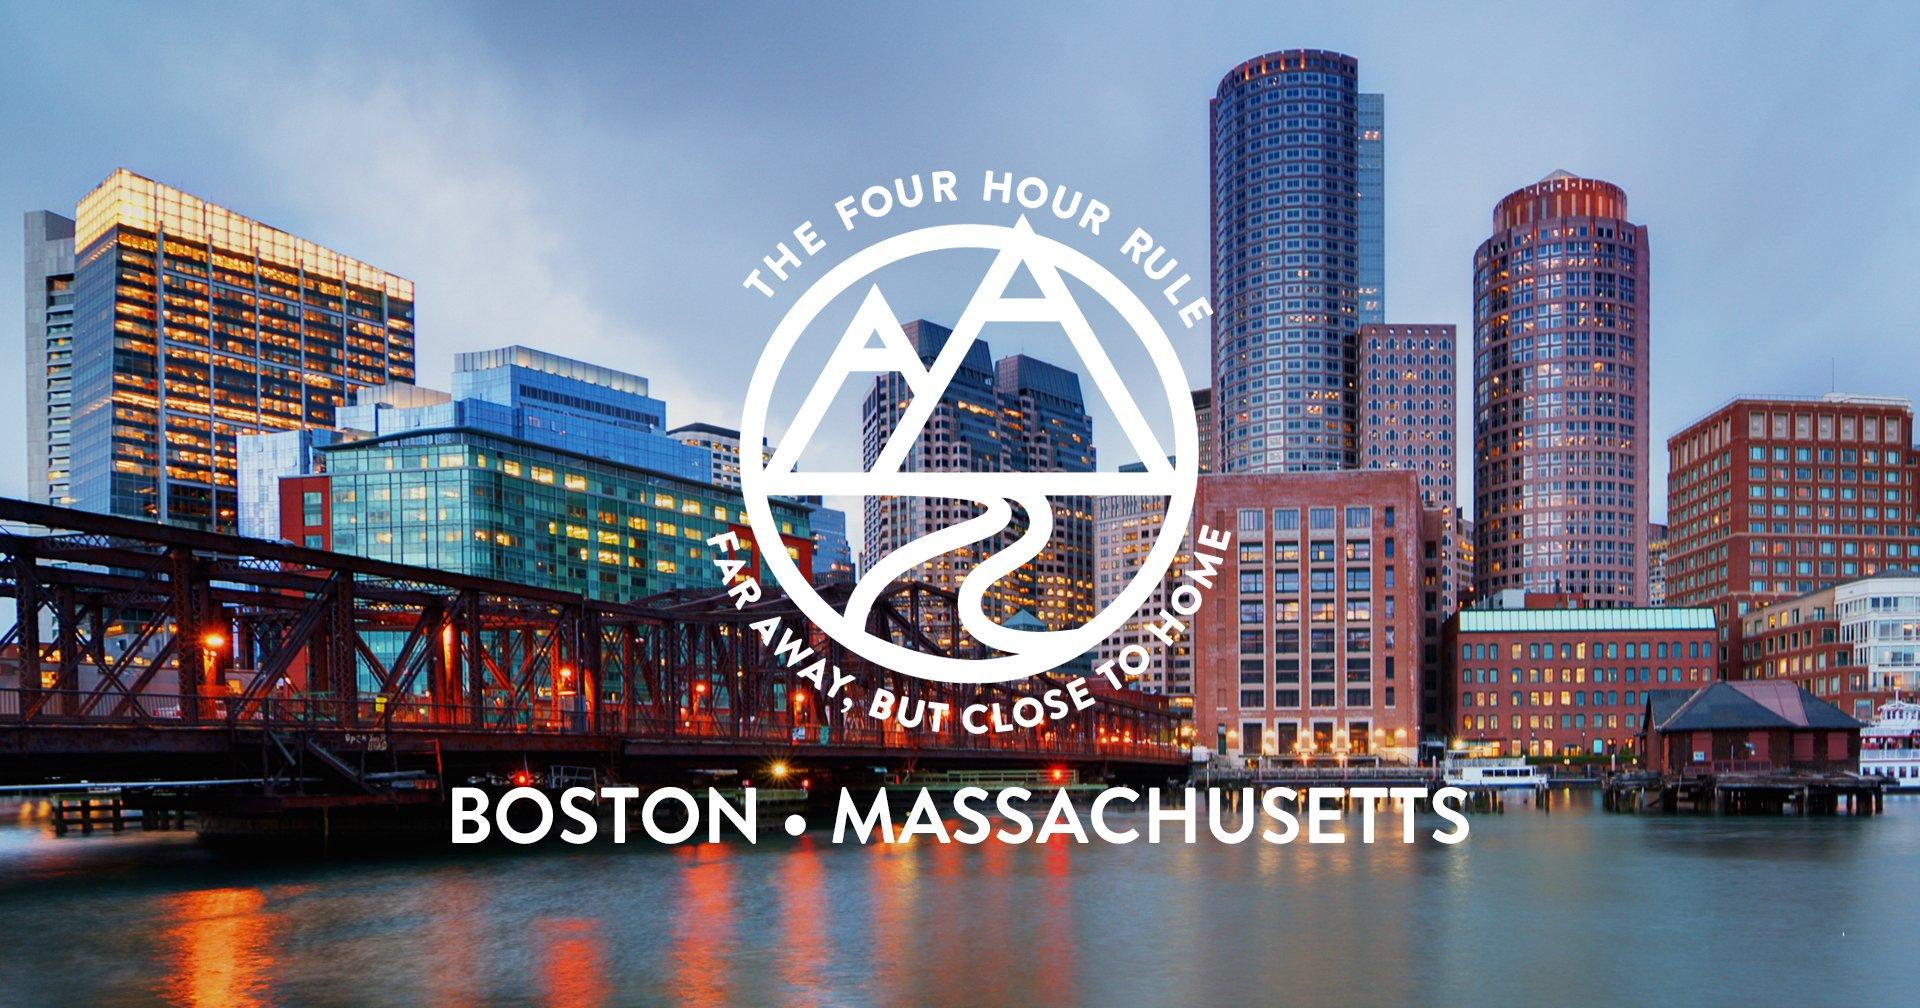 Stanza Dei Sigari Boston : Hour rule boston insidehook